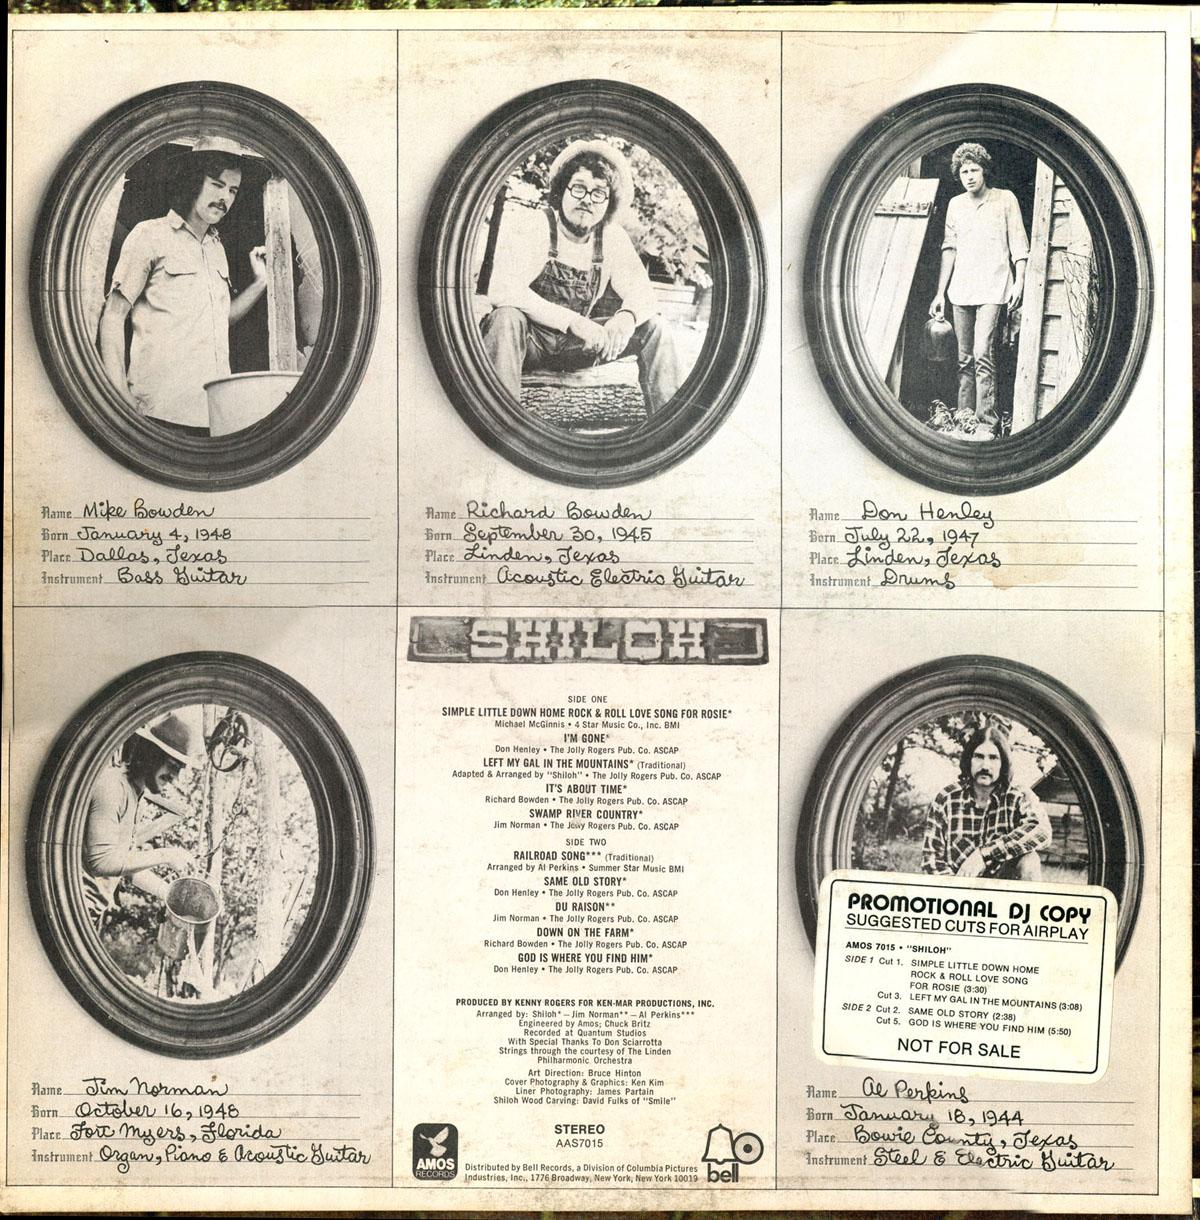 Shiloh 1970